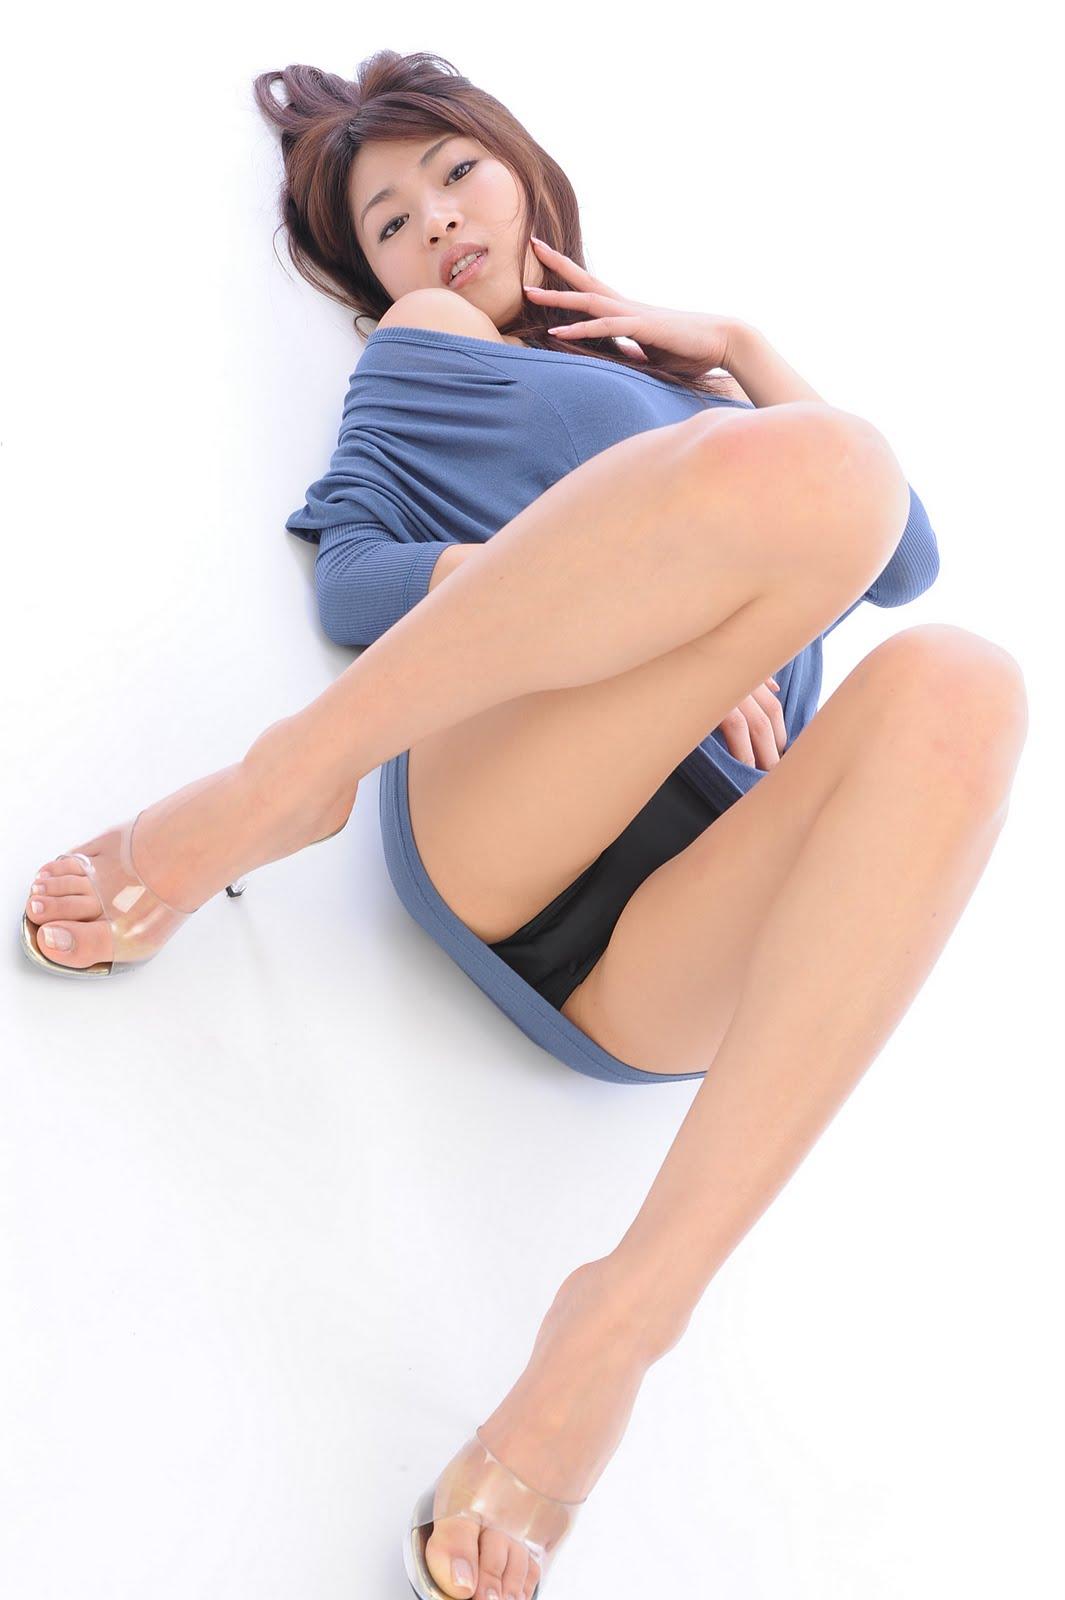 Hot asian slut sucks white cock and swallows 2